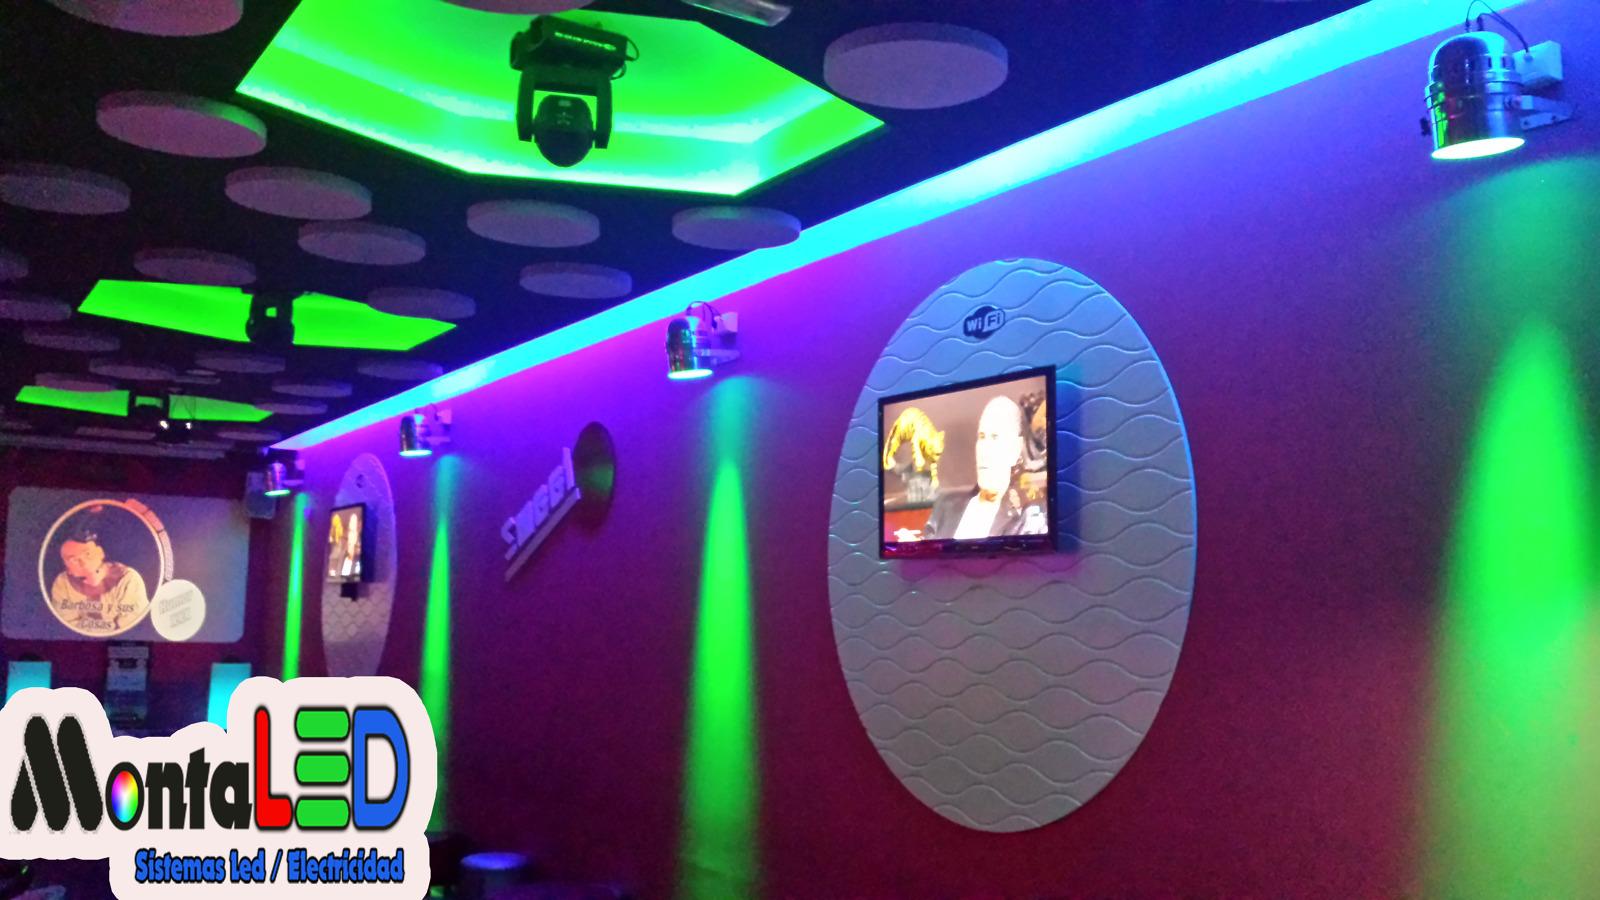 Foto instalaci n led bar de copas de montaled 439426 - Decoracion de bares de copas ...